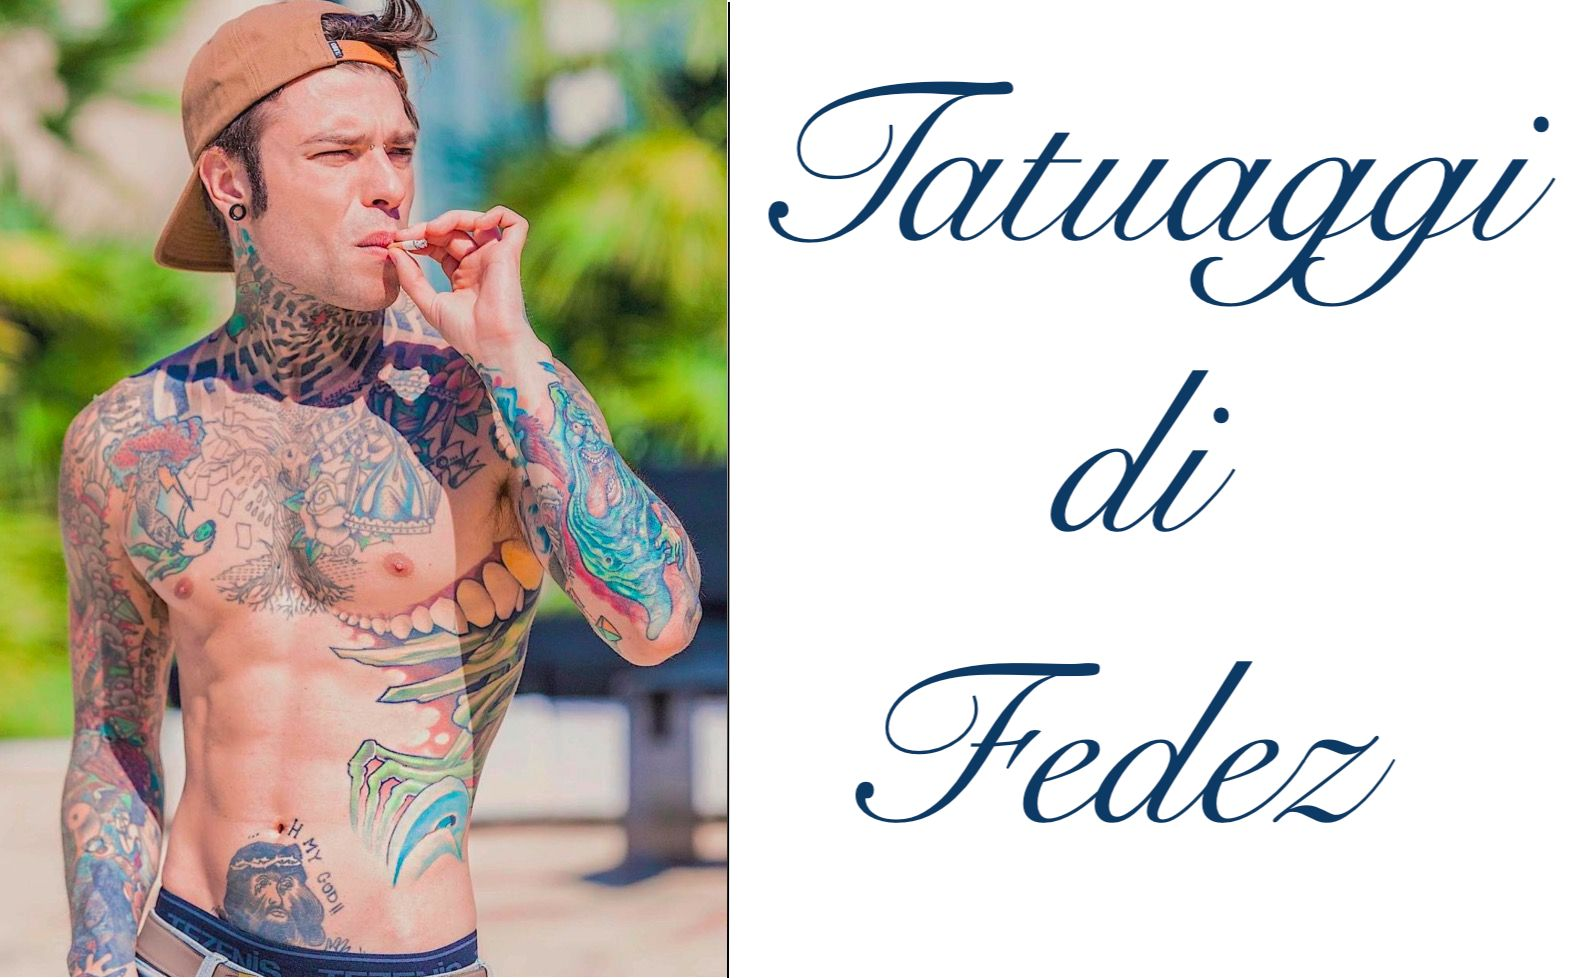 Tatuaggio Tattoo Fedez Significato